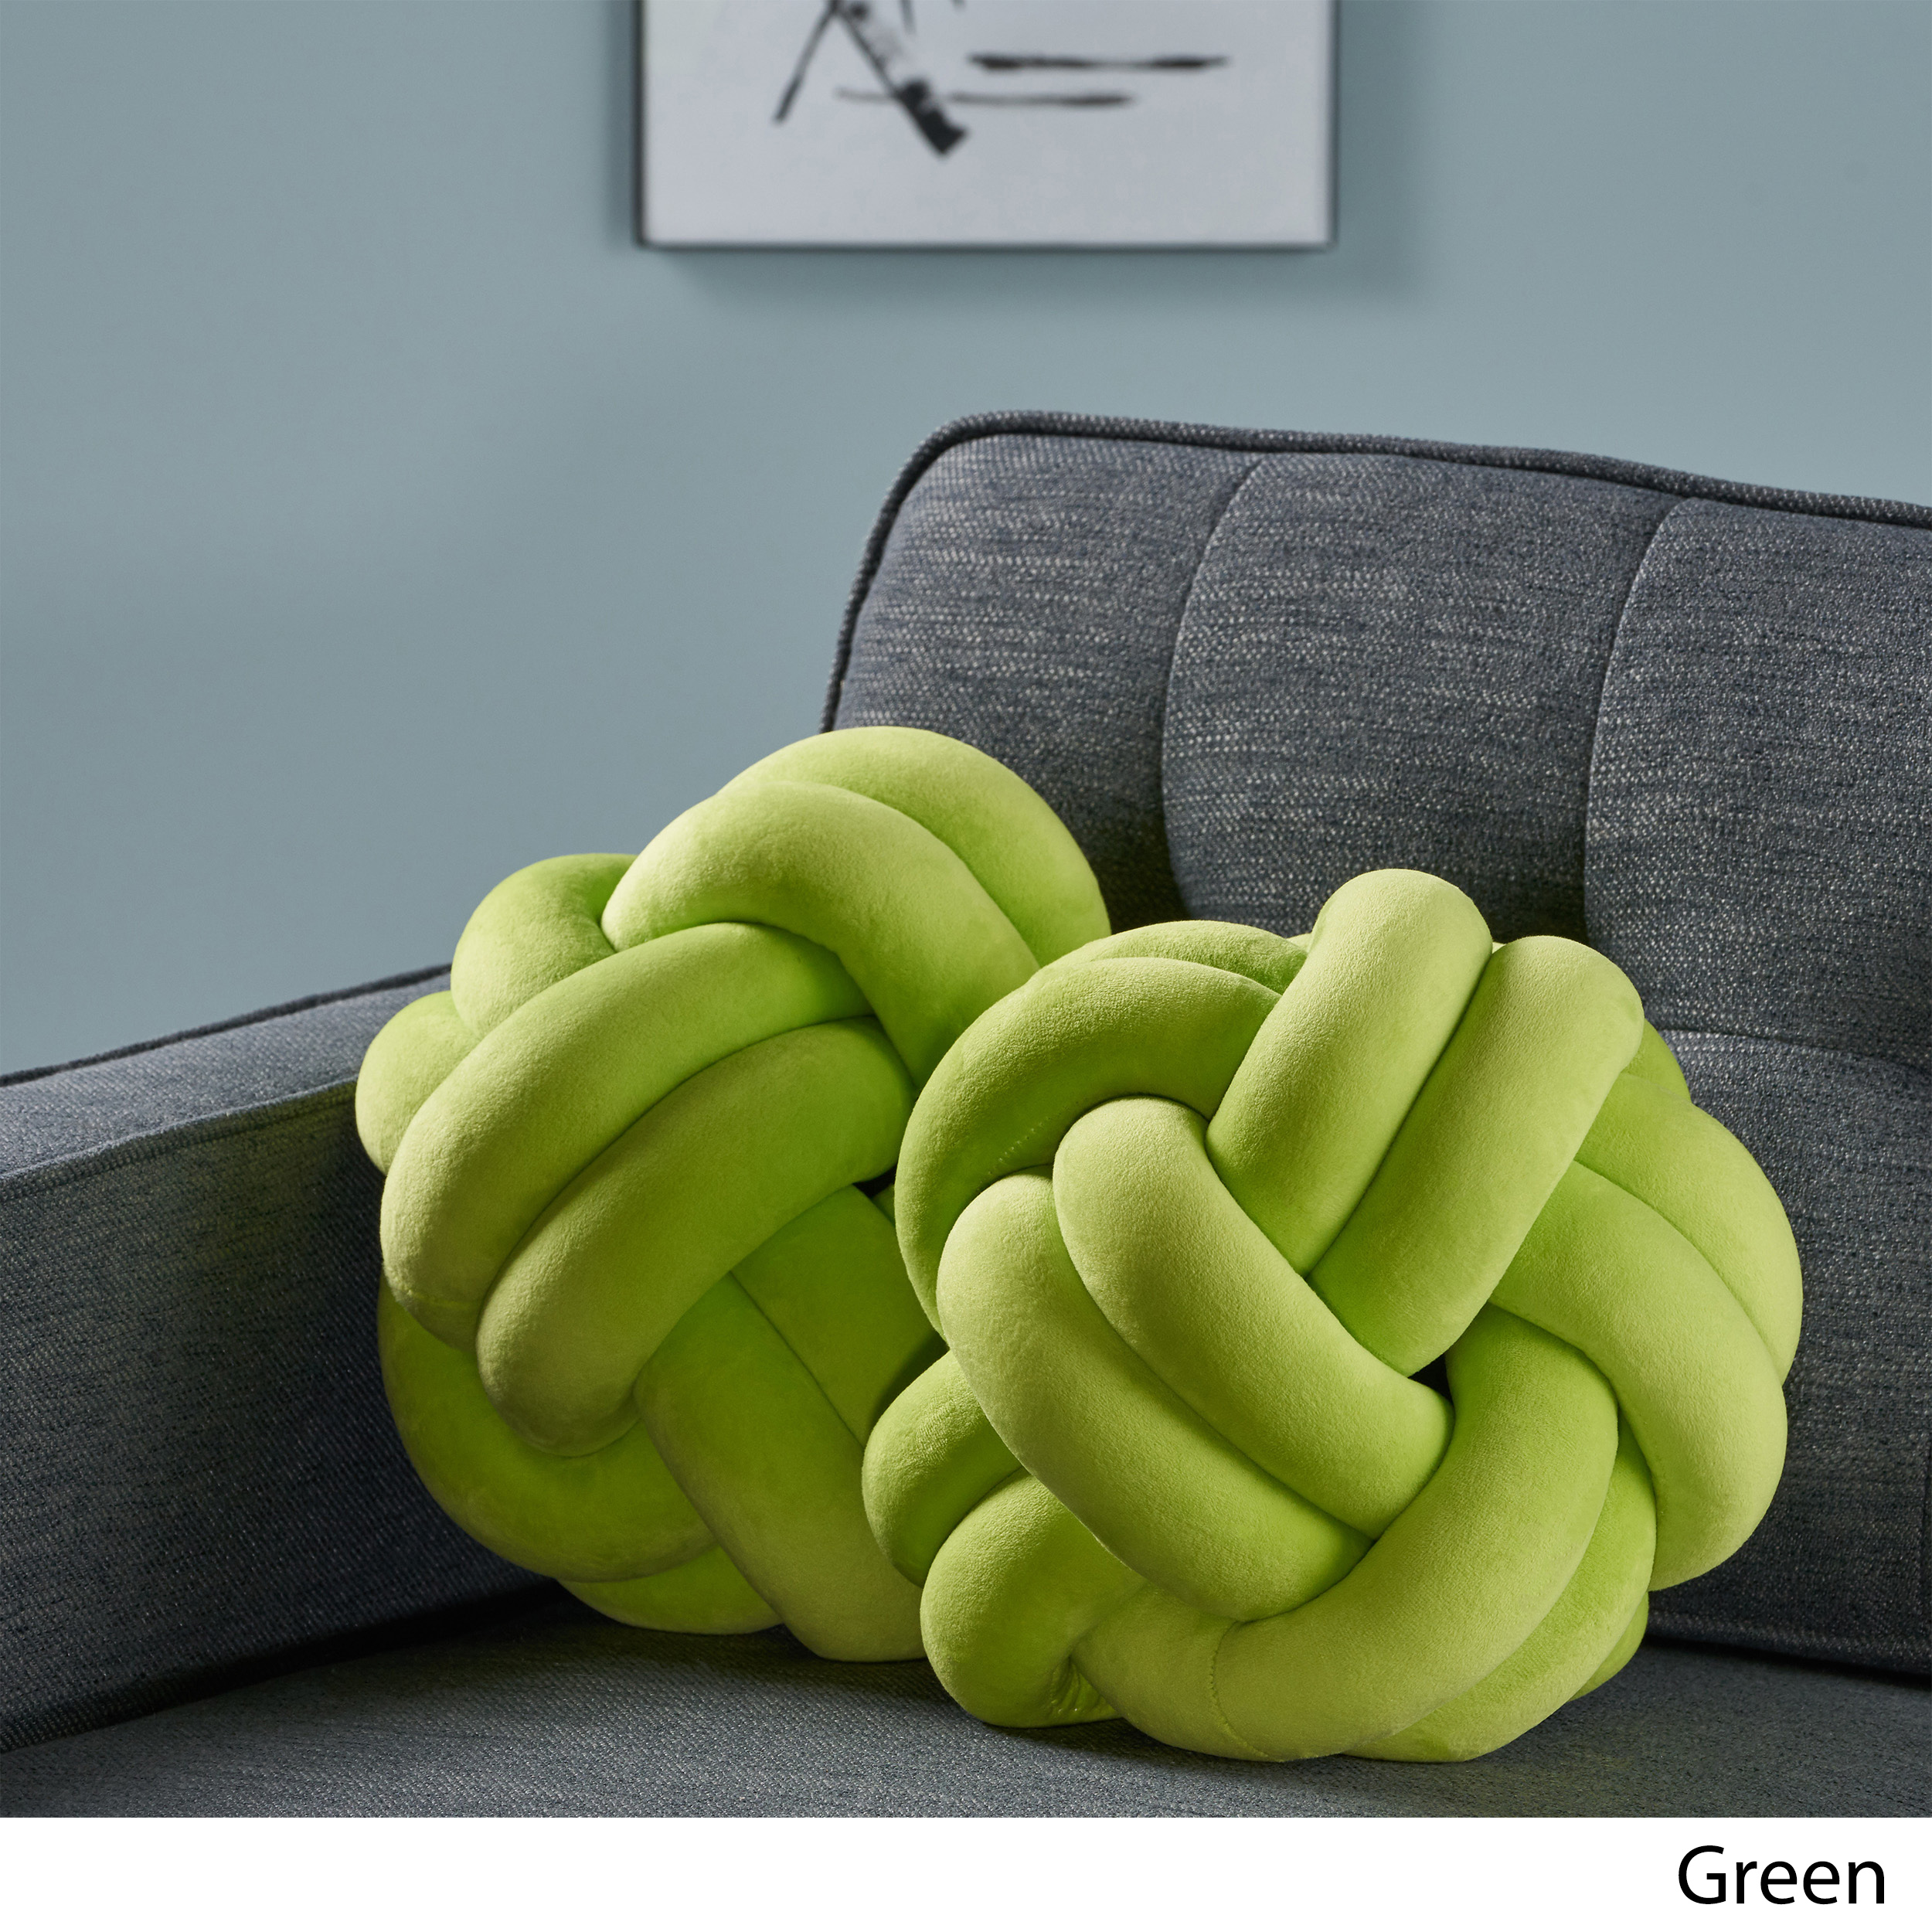 Estelle-Modern-Soft-Velvet-Clove-Hitch-Knot-Pillows-Set-of-2 thumbnail 7